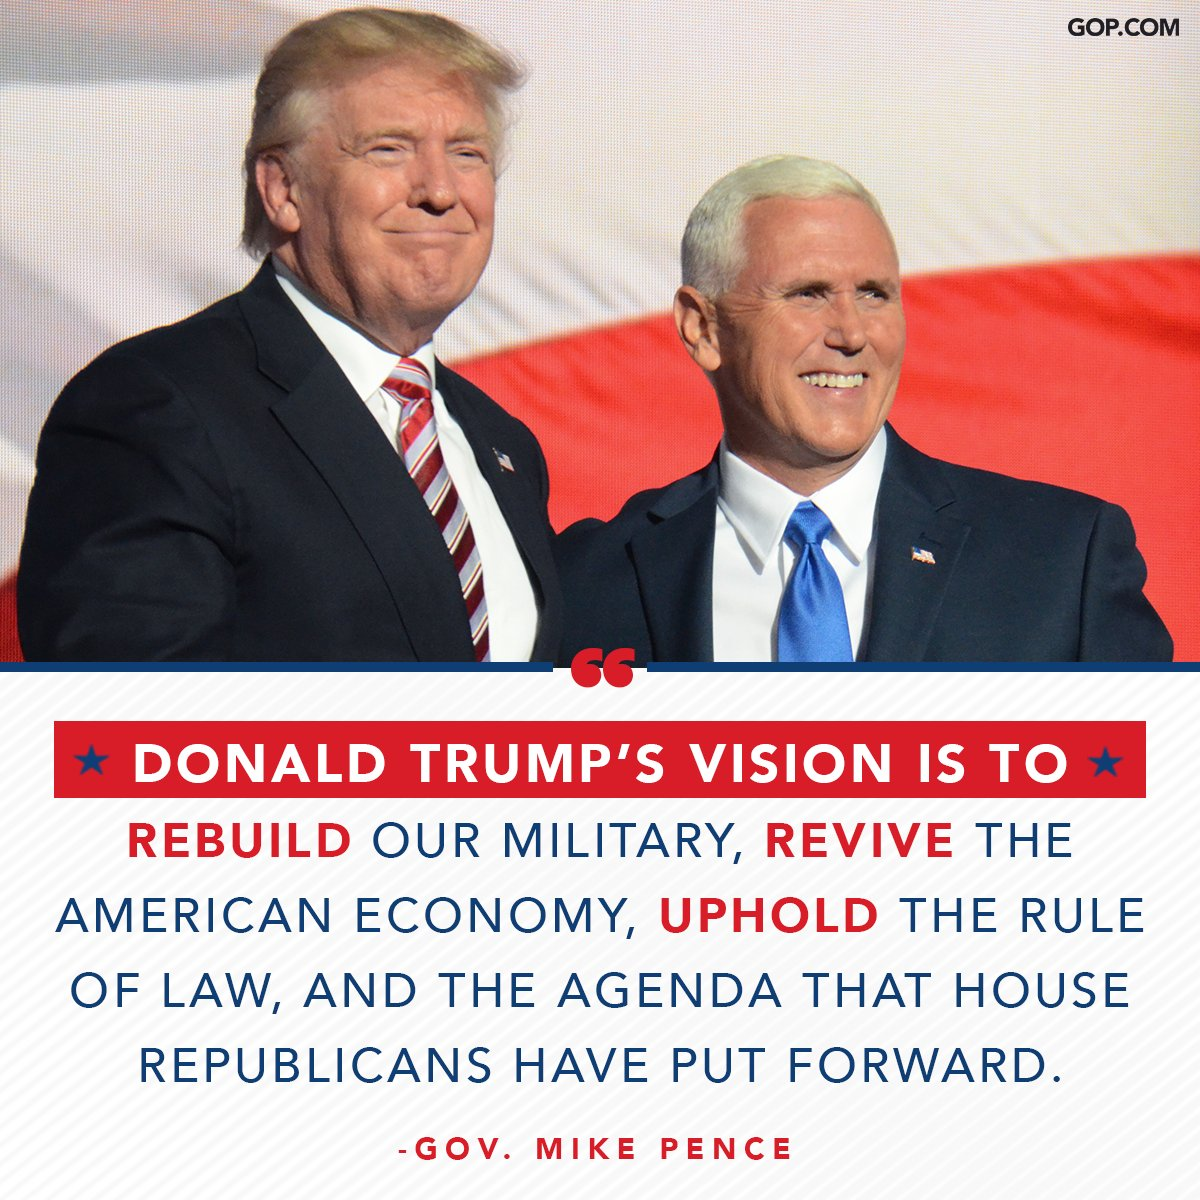 @REALDonaldTrump SEEK #TRUTH U.S.A. #TRUMP2017 @GOP #DonaldJTrump: Must Put Americans 1st! #GOP @DCAccountable!<br>http://pic.twitter.com/Khm6Uy1DIv